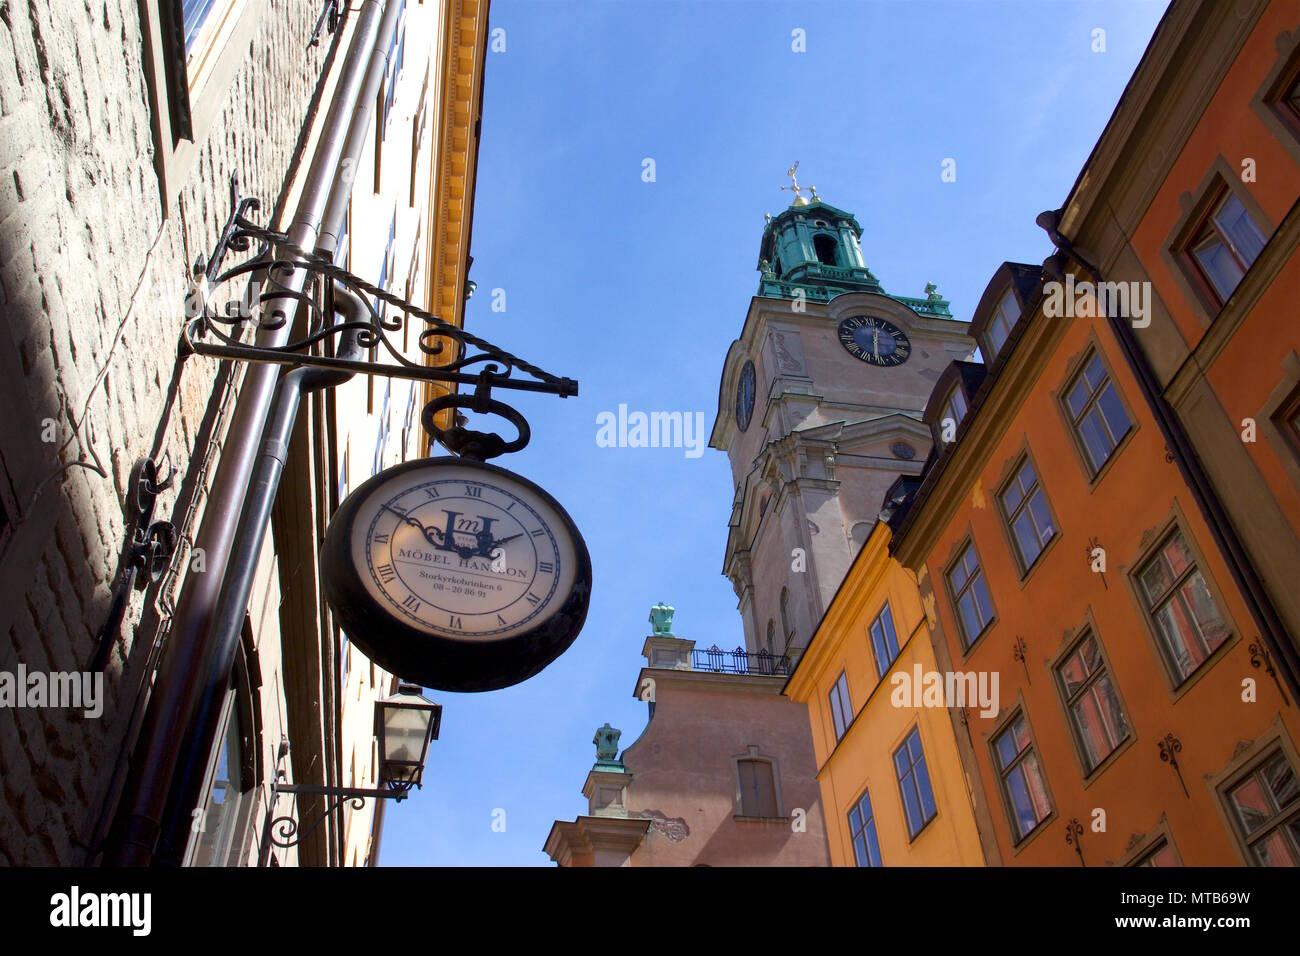 A clock used as a shop sign for Mobel Hansson, which is an antique shop on Storkyrkobrinken, Gamla Stan, Stockholm, Sweden - Stock Image